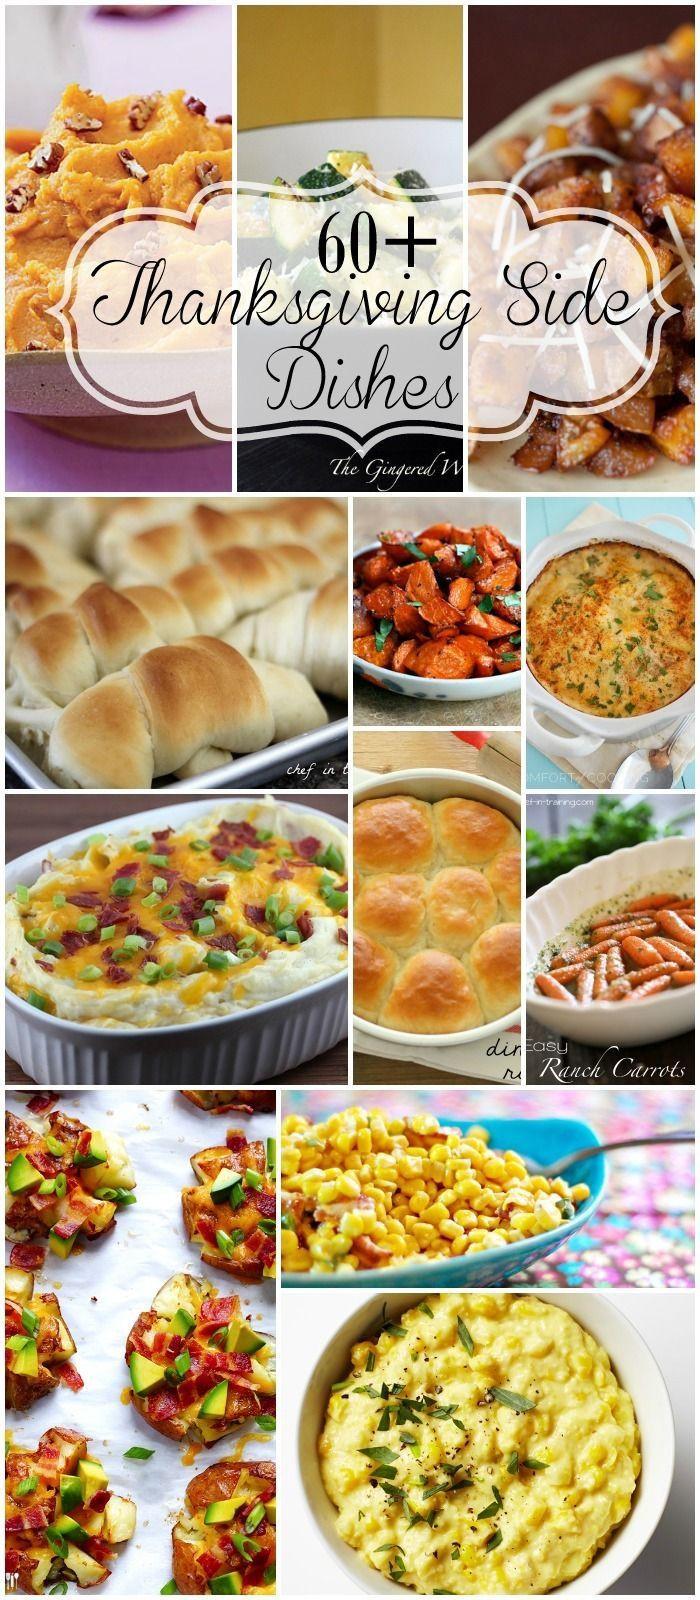 Thanksgiving Dinner Ideas Pinterest  60 Thanksgiving Sides veggies potatoes and rolls